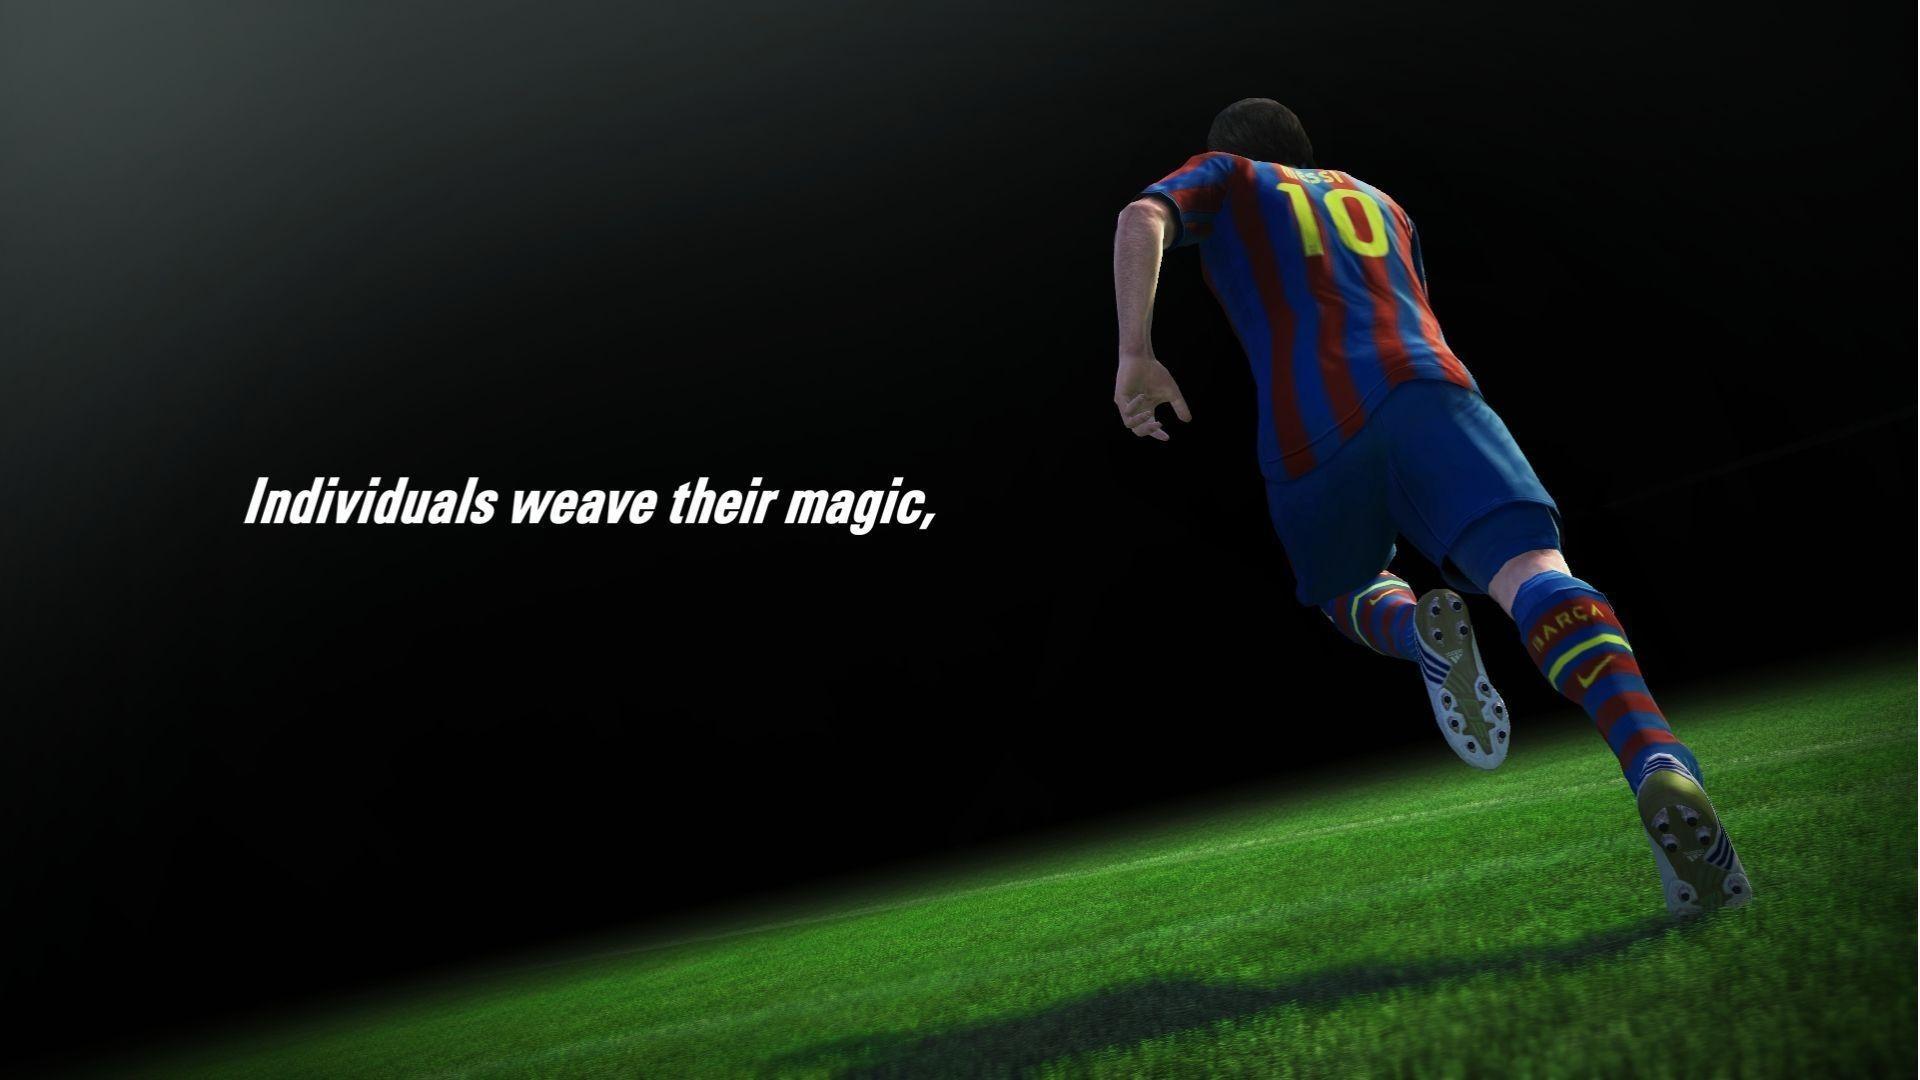 Football Wallpaper Sport Football Kids: Cool Football Backgrounds (52+ Pictures